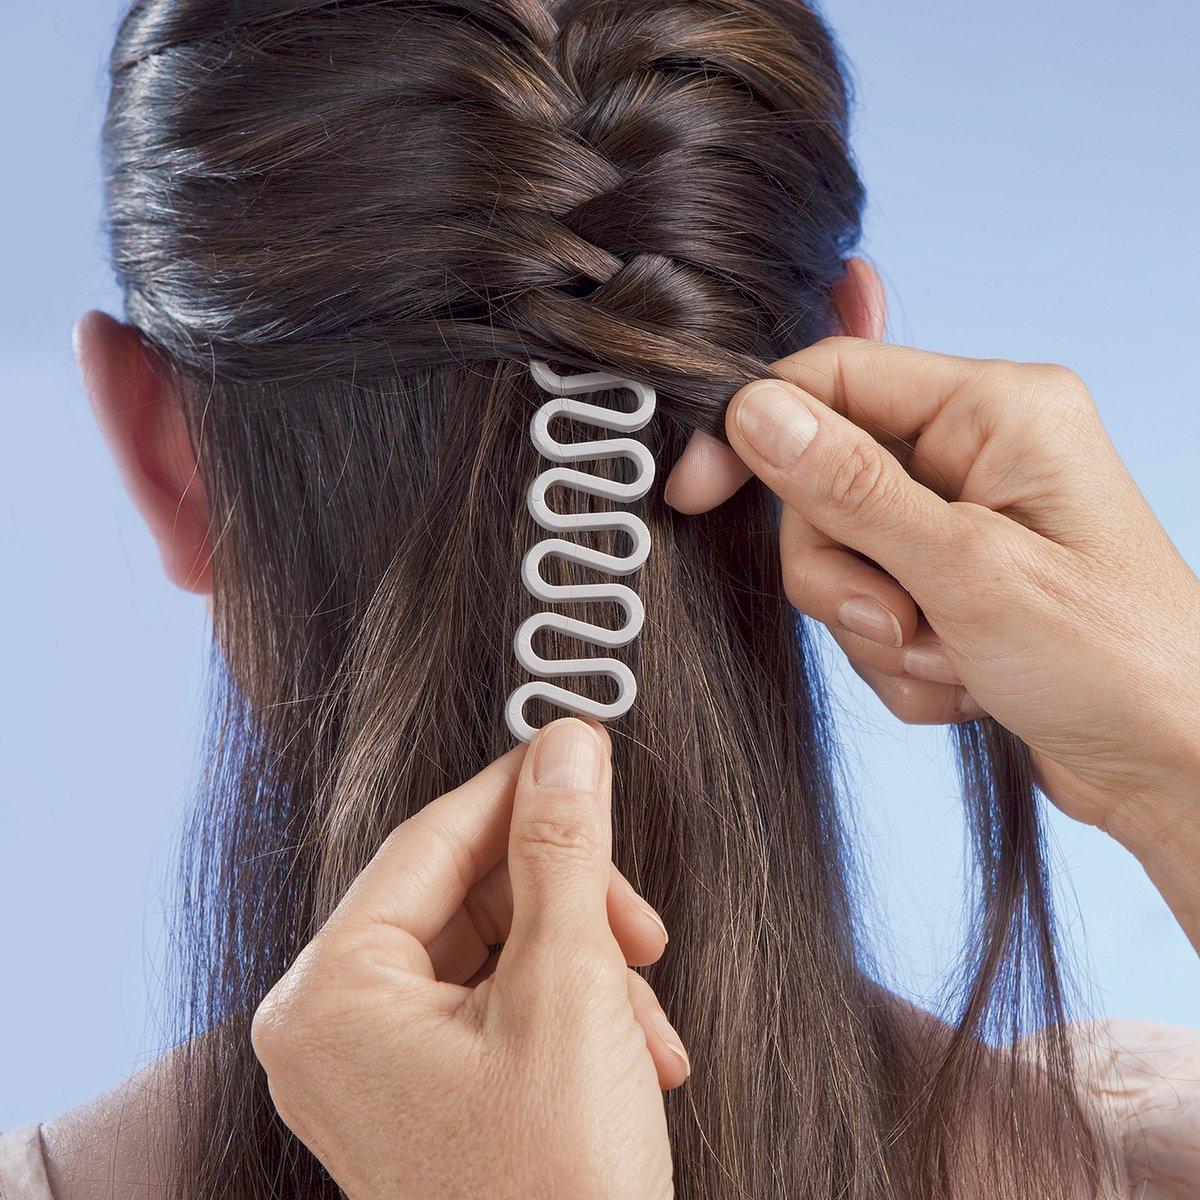 ANKKO Stylish French Hair Braided Styling Tool Hair Roller Braiders Magic Hair Twist Tool (White)